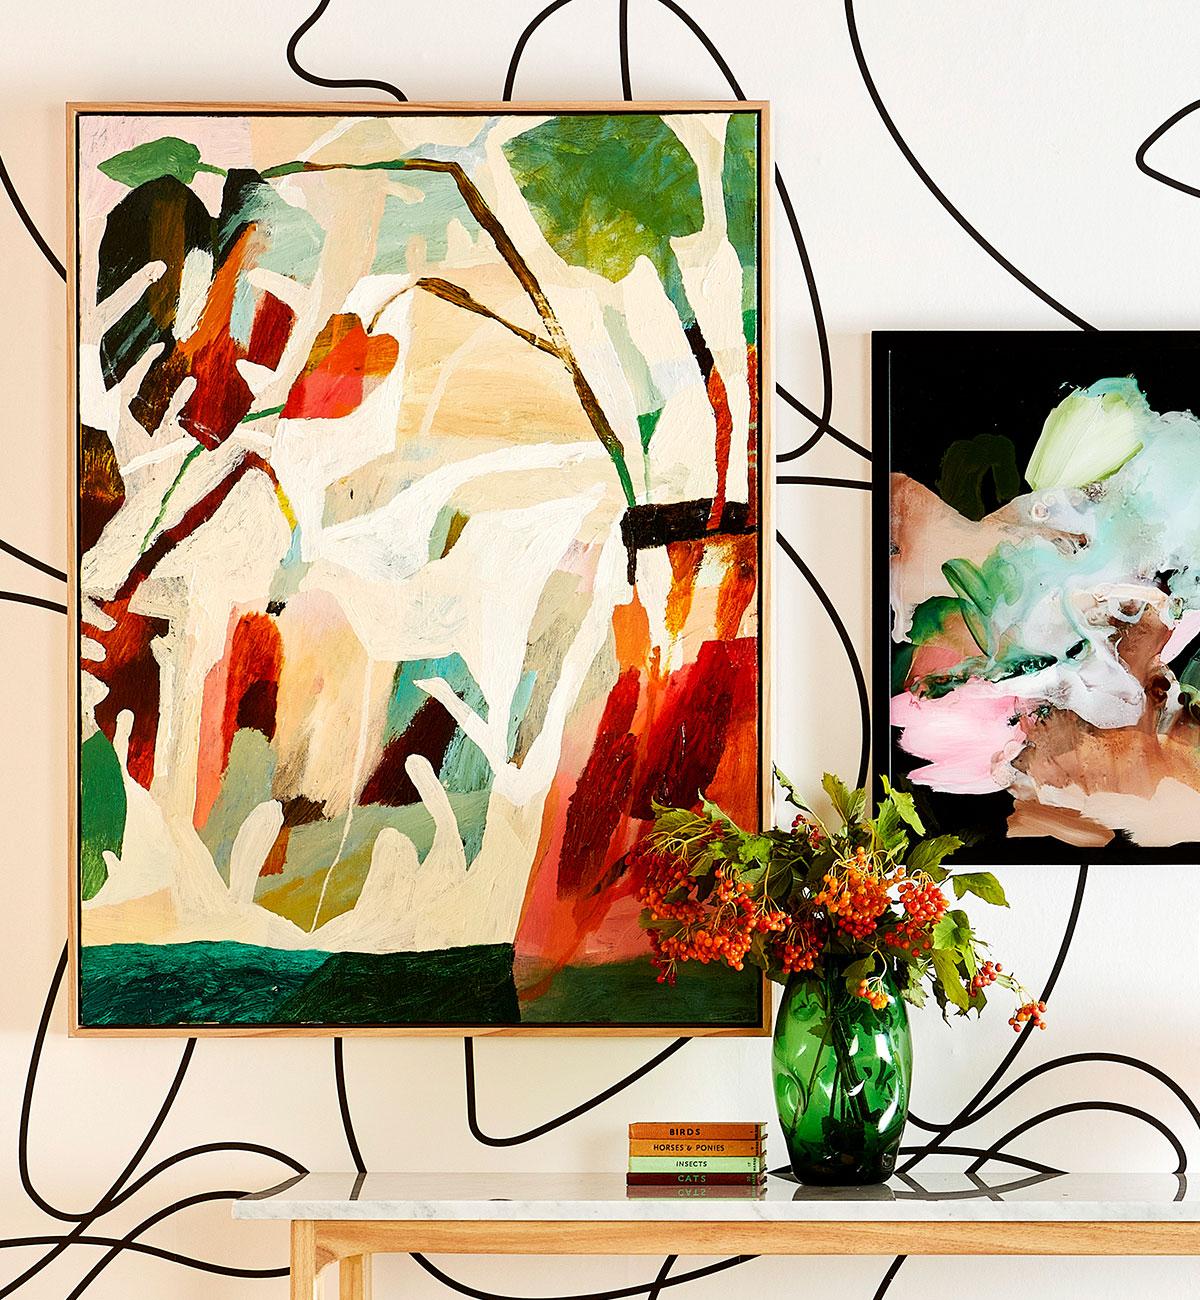 https://storage.googleapis.com/dtk-fenton-fenton/page/Megan-Grant-Leaf-Collage-Situ_1585032516355.jpg